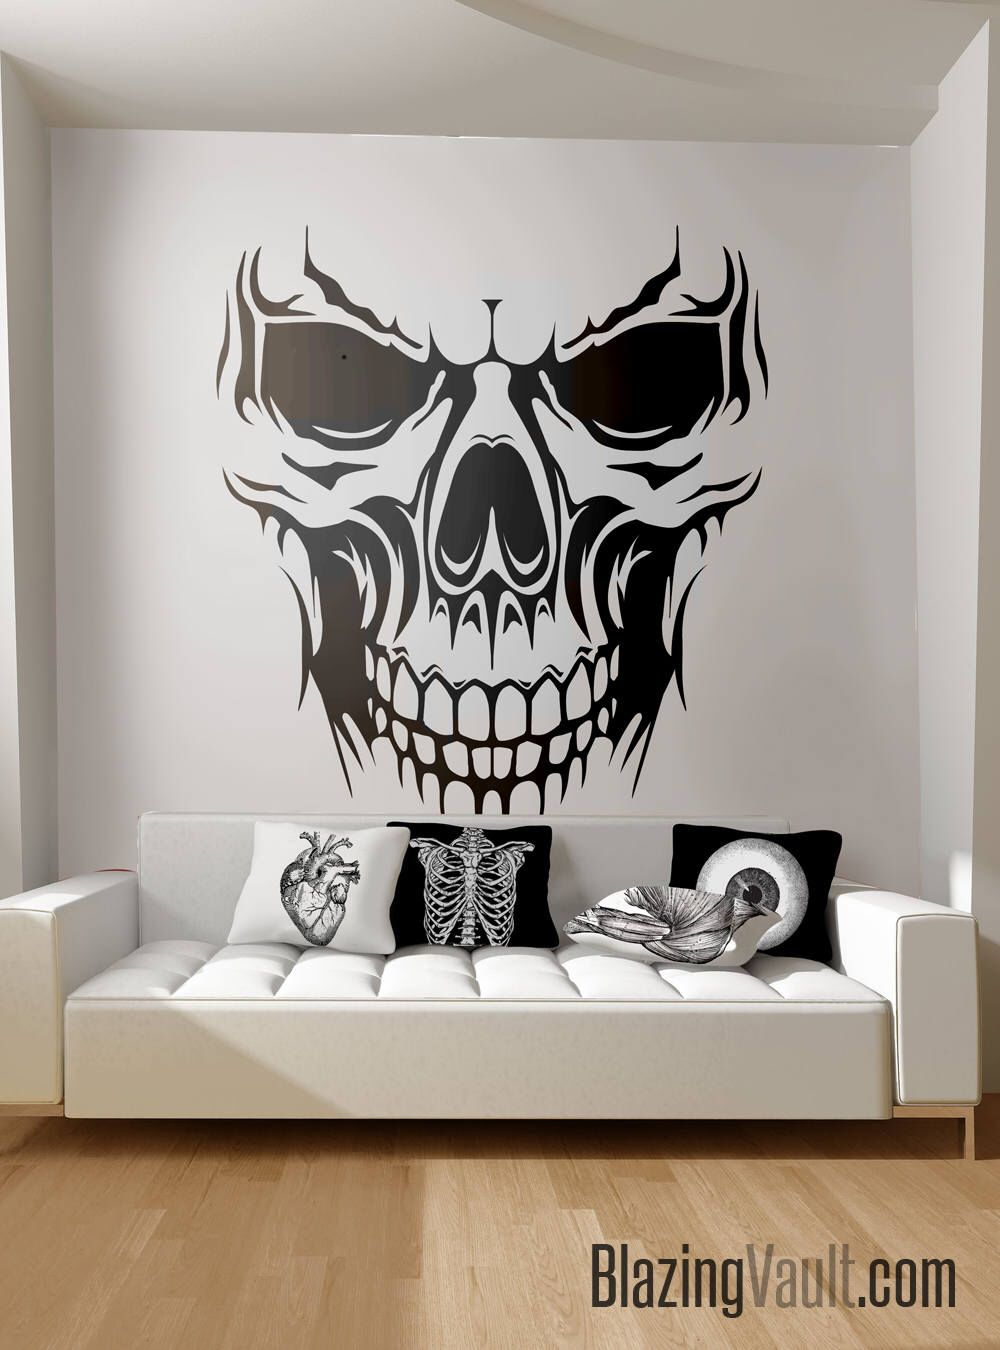 Skull wall decal skeleton bones biker biohazard radioactive danger hazardous nuclear zombie apocalypse poison death